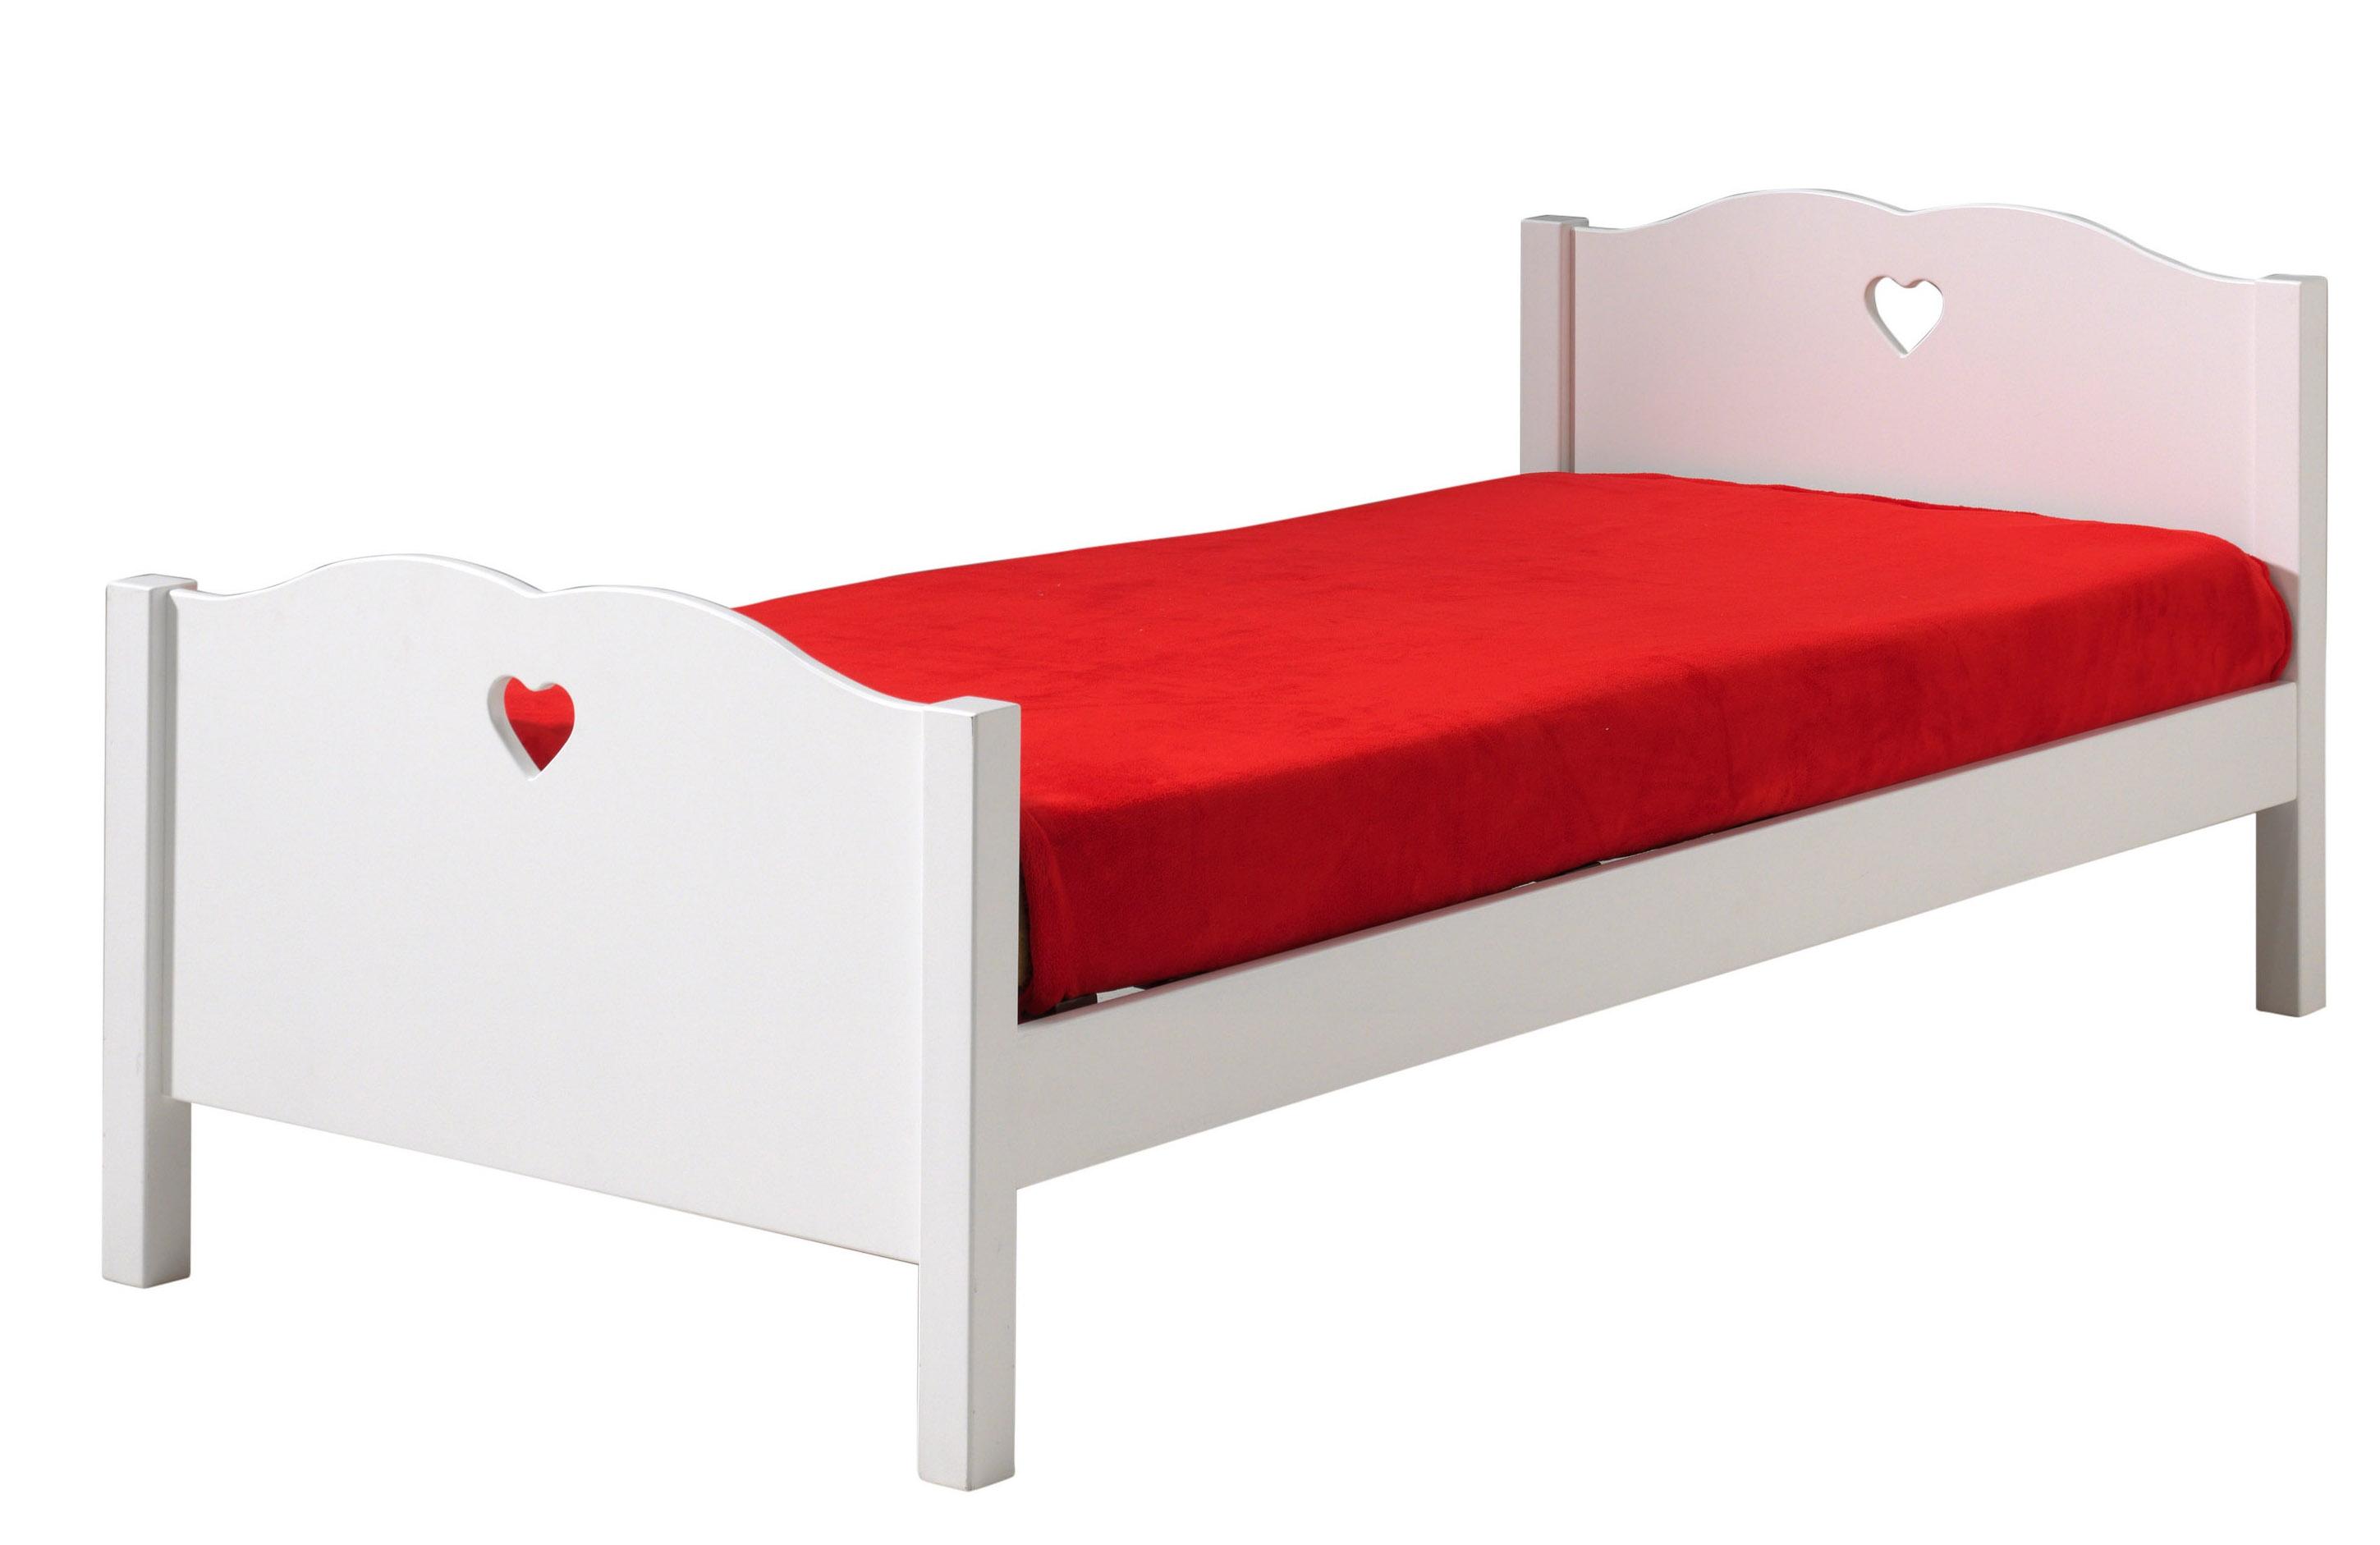 lit laqu blanc coeur. Black Bedroom Furniture Sets. Home Design Ideas